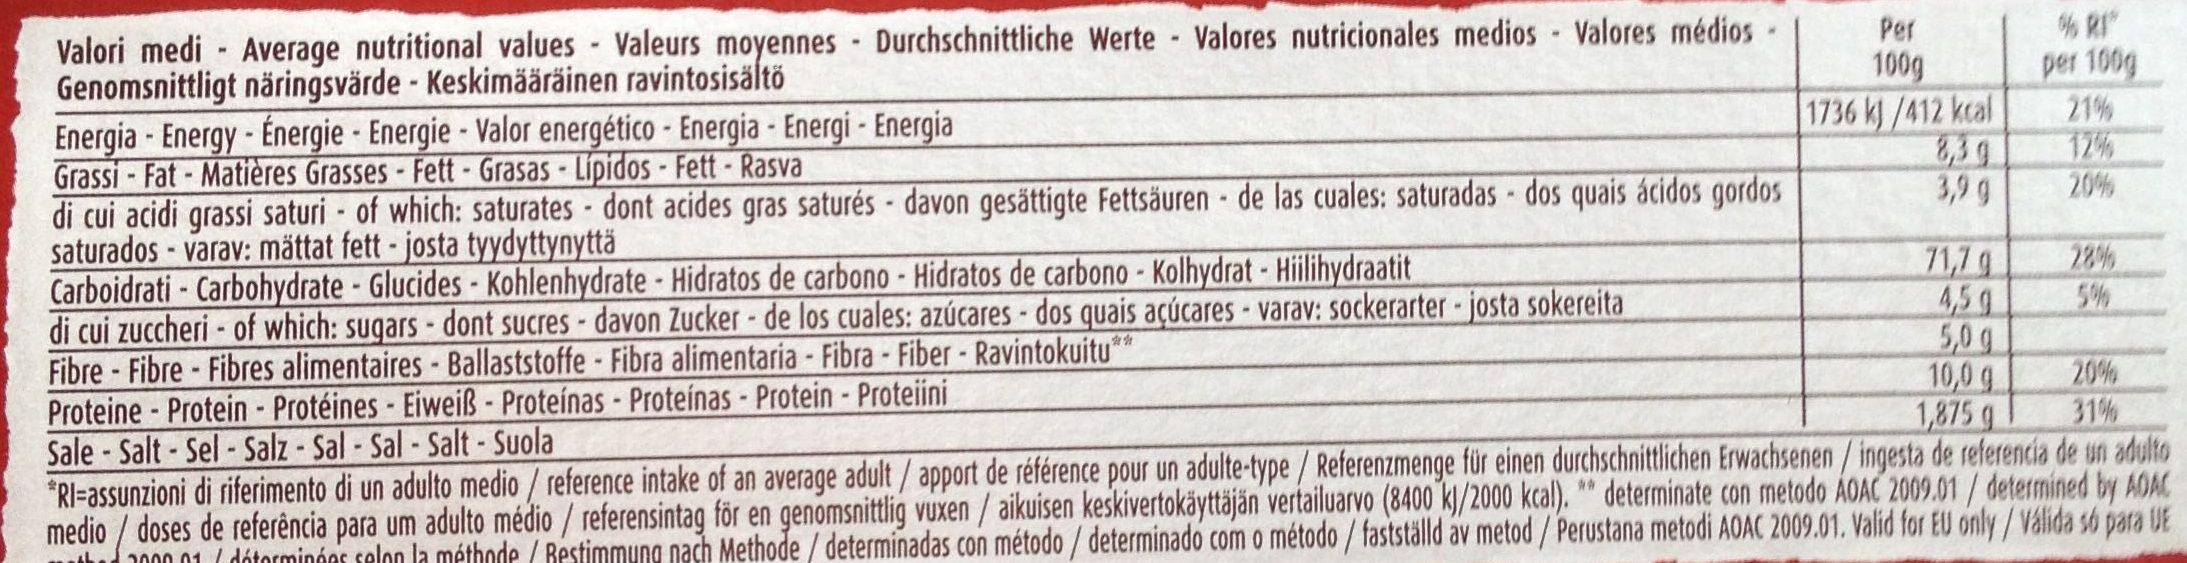 Torinesi - Informations nutritionnelles